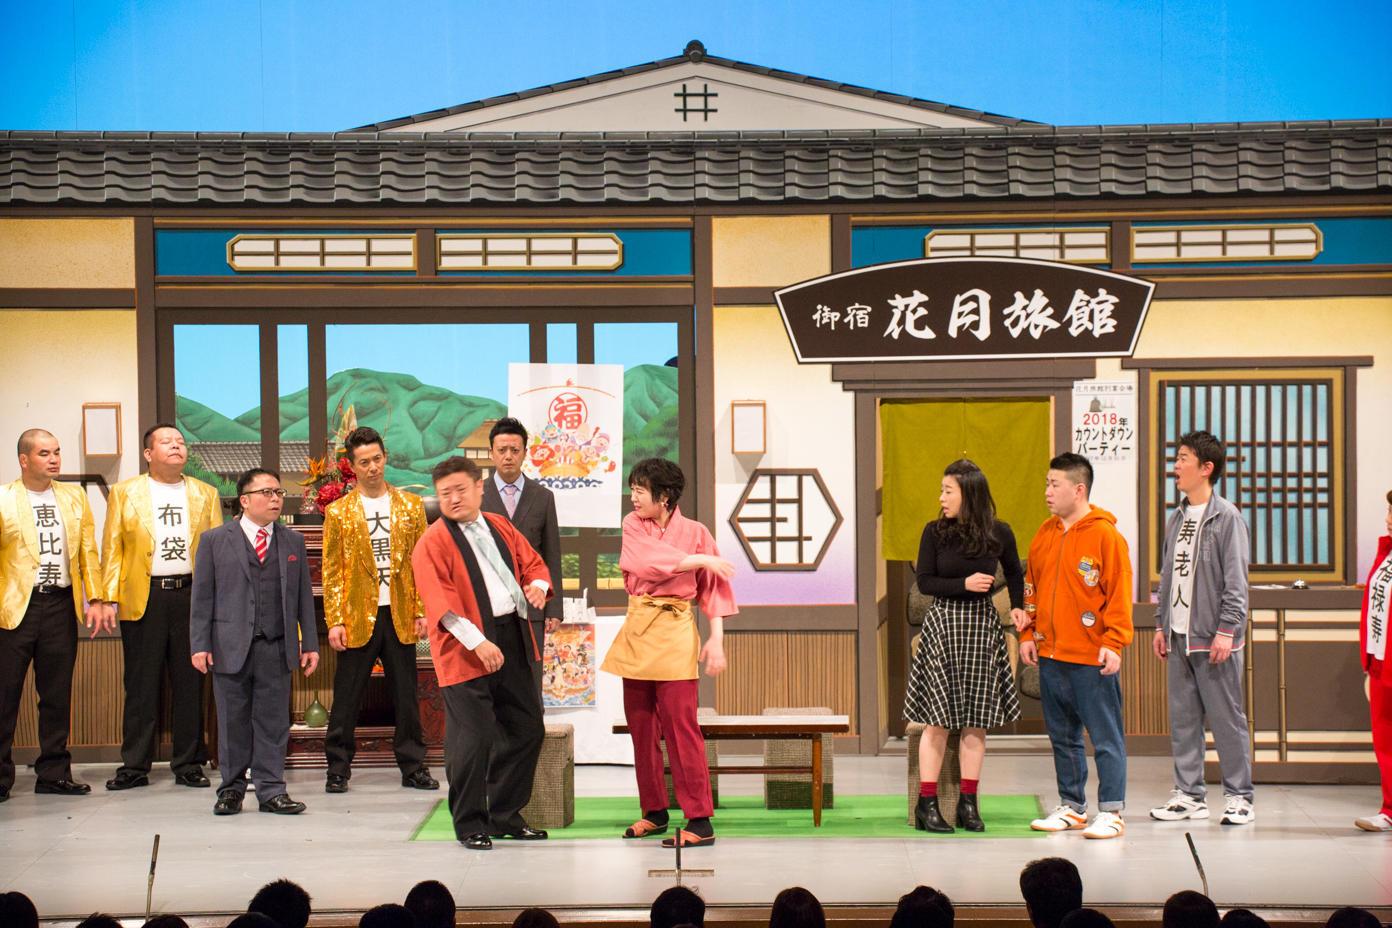 http://news.yoshimoto.co.jp/20180101200257-b5151678814b79c711b148a1962ddb6d97a968fa.jpg